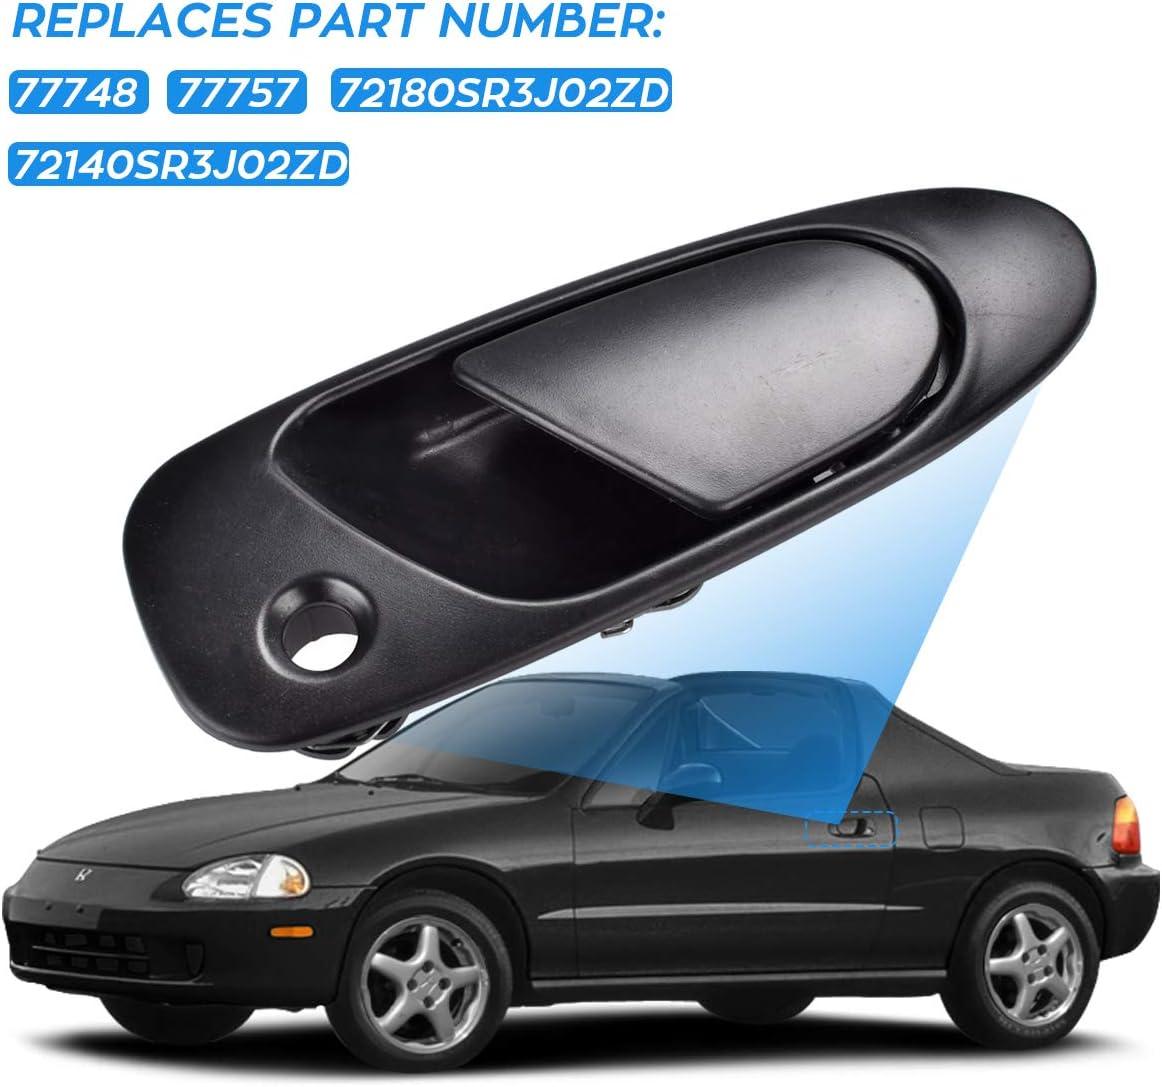 FAERSI Outside Exterior Door Handle Front Driver /& Passenger Side for Honda Civic /& Civic Del Sol 1992 1993 1994 1995 Civic /& 1993-1997 Civic Del Sol 72180SR3J02ZD 72140SR3J02ZD